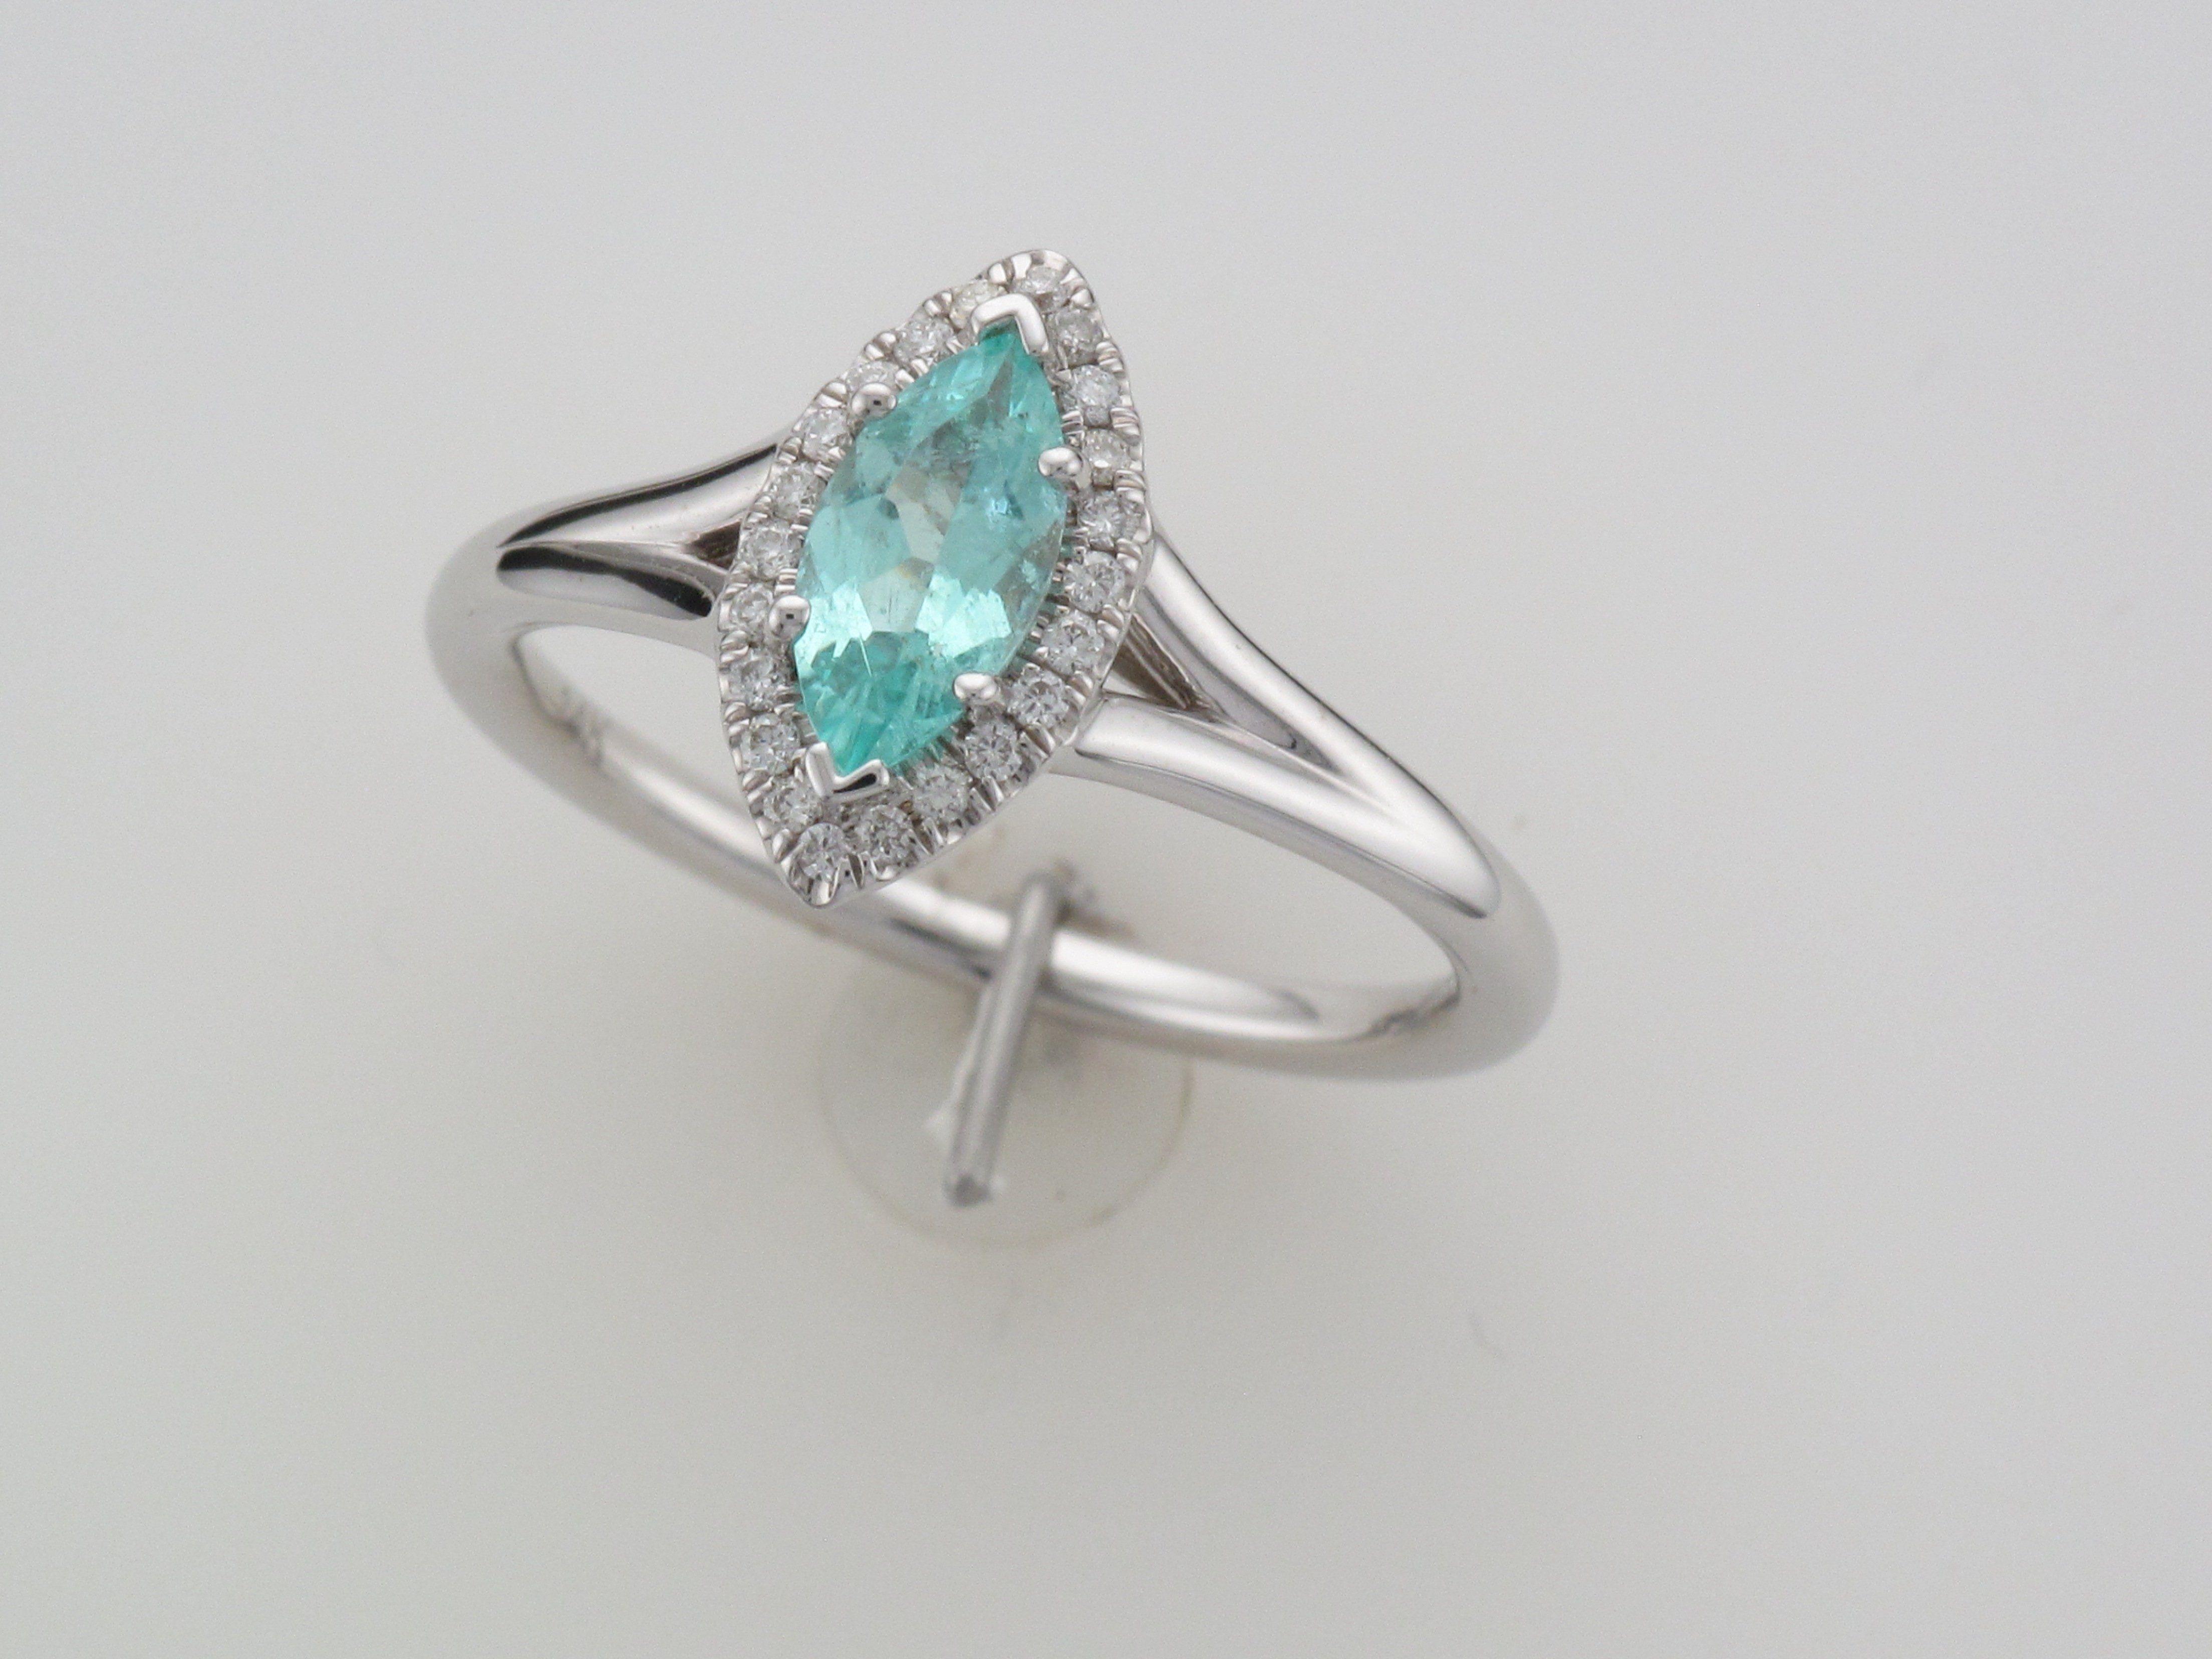 e7499839b1971 Tropical Blue Paraiba Tourmaline Ring with diamonds by Coast Diamond ...